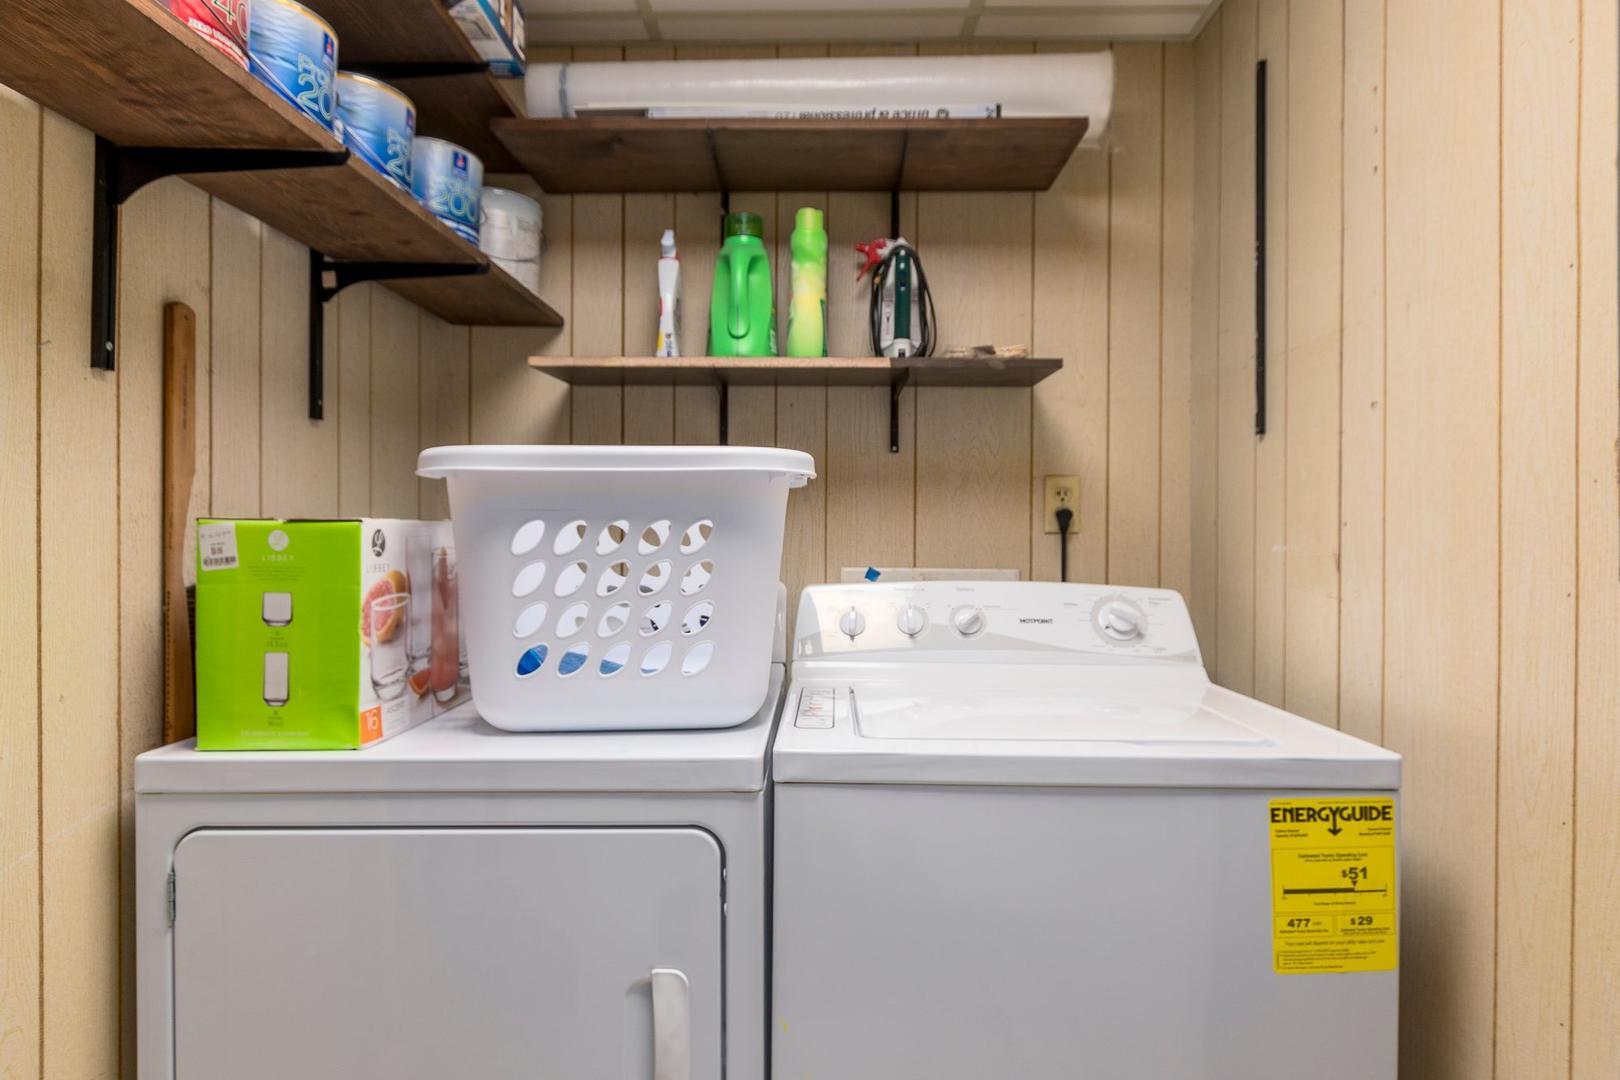 Oceanside 136 6 - Laundry Area